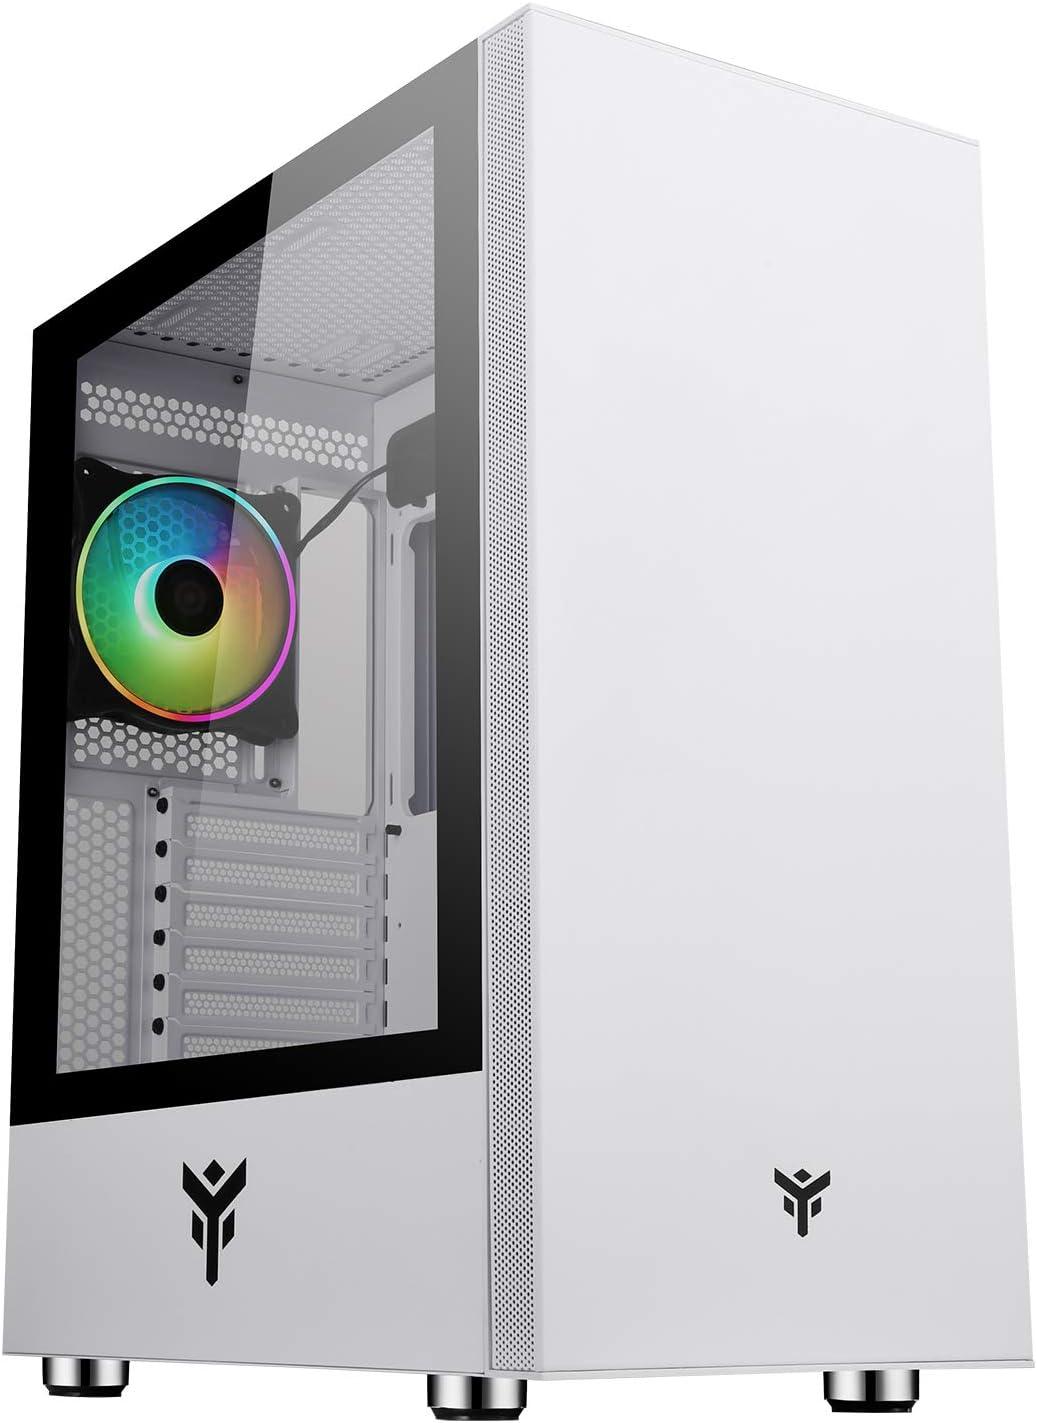 Case Itek Vertibra S210W - Torre de Juegos Middle Tower, 12 cm ARGB, 2 x USB3, Side Panel Temp Glass, White Edition